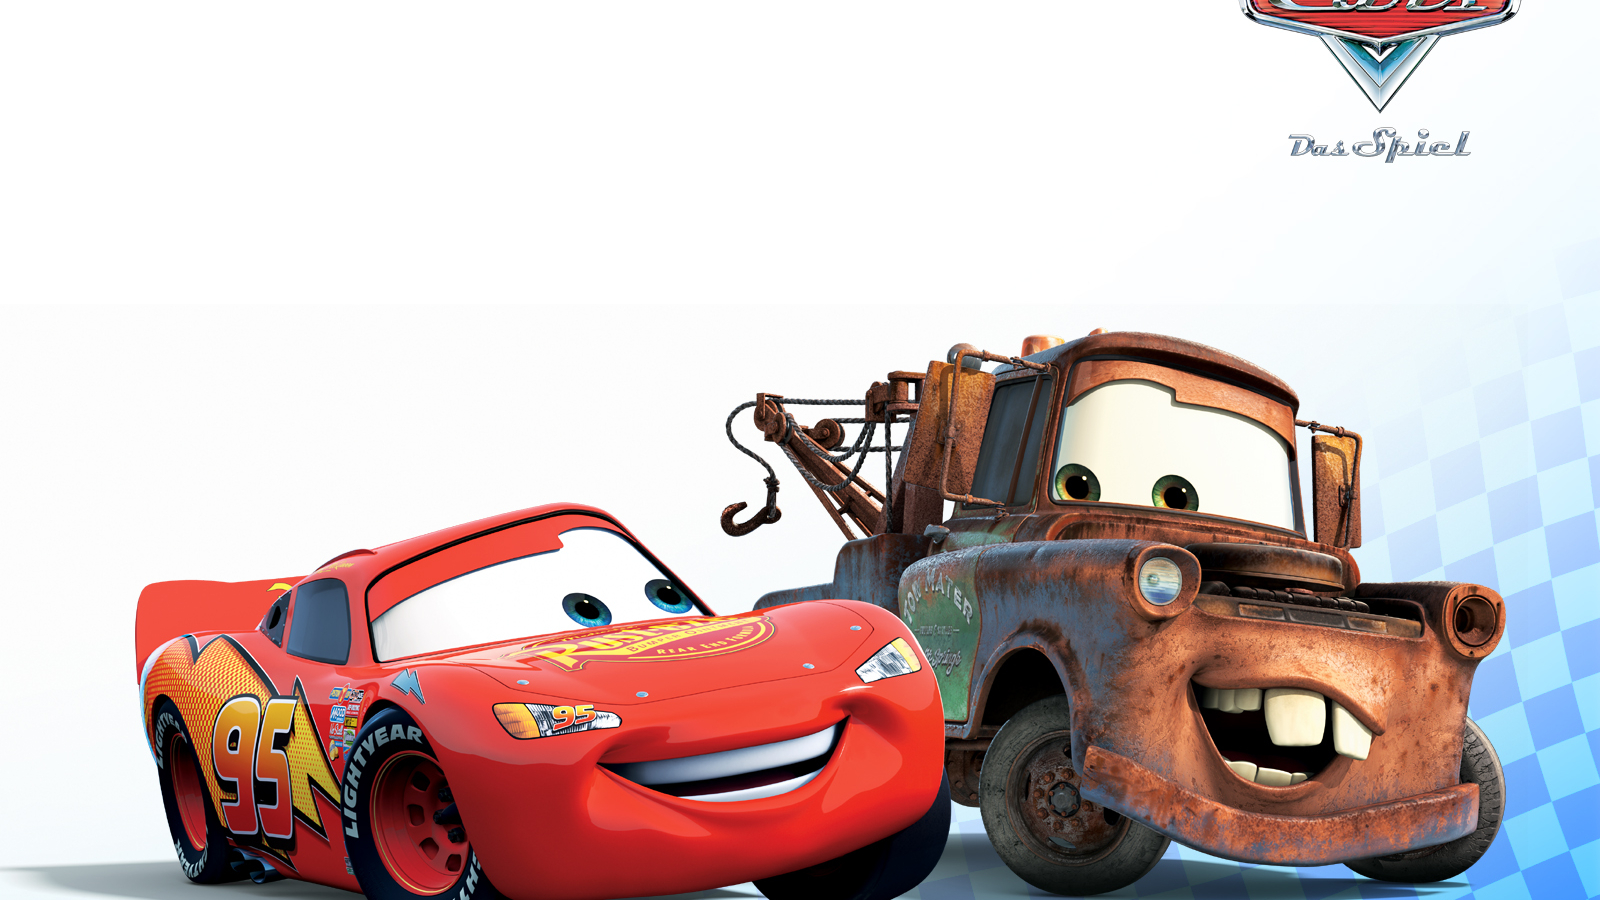 Disney Cars Wallpaper Disney Cars Wallpapers 1600x1200. Download  Resolutions: Desktop: 1600x900 ...